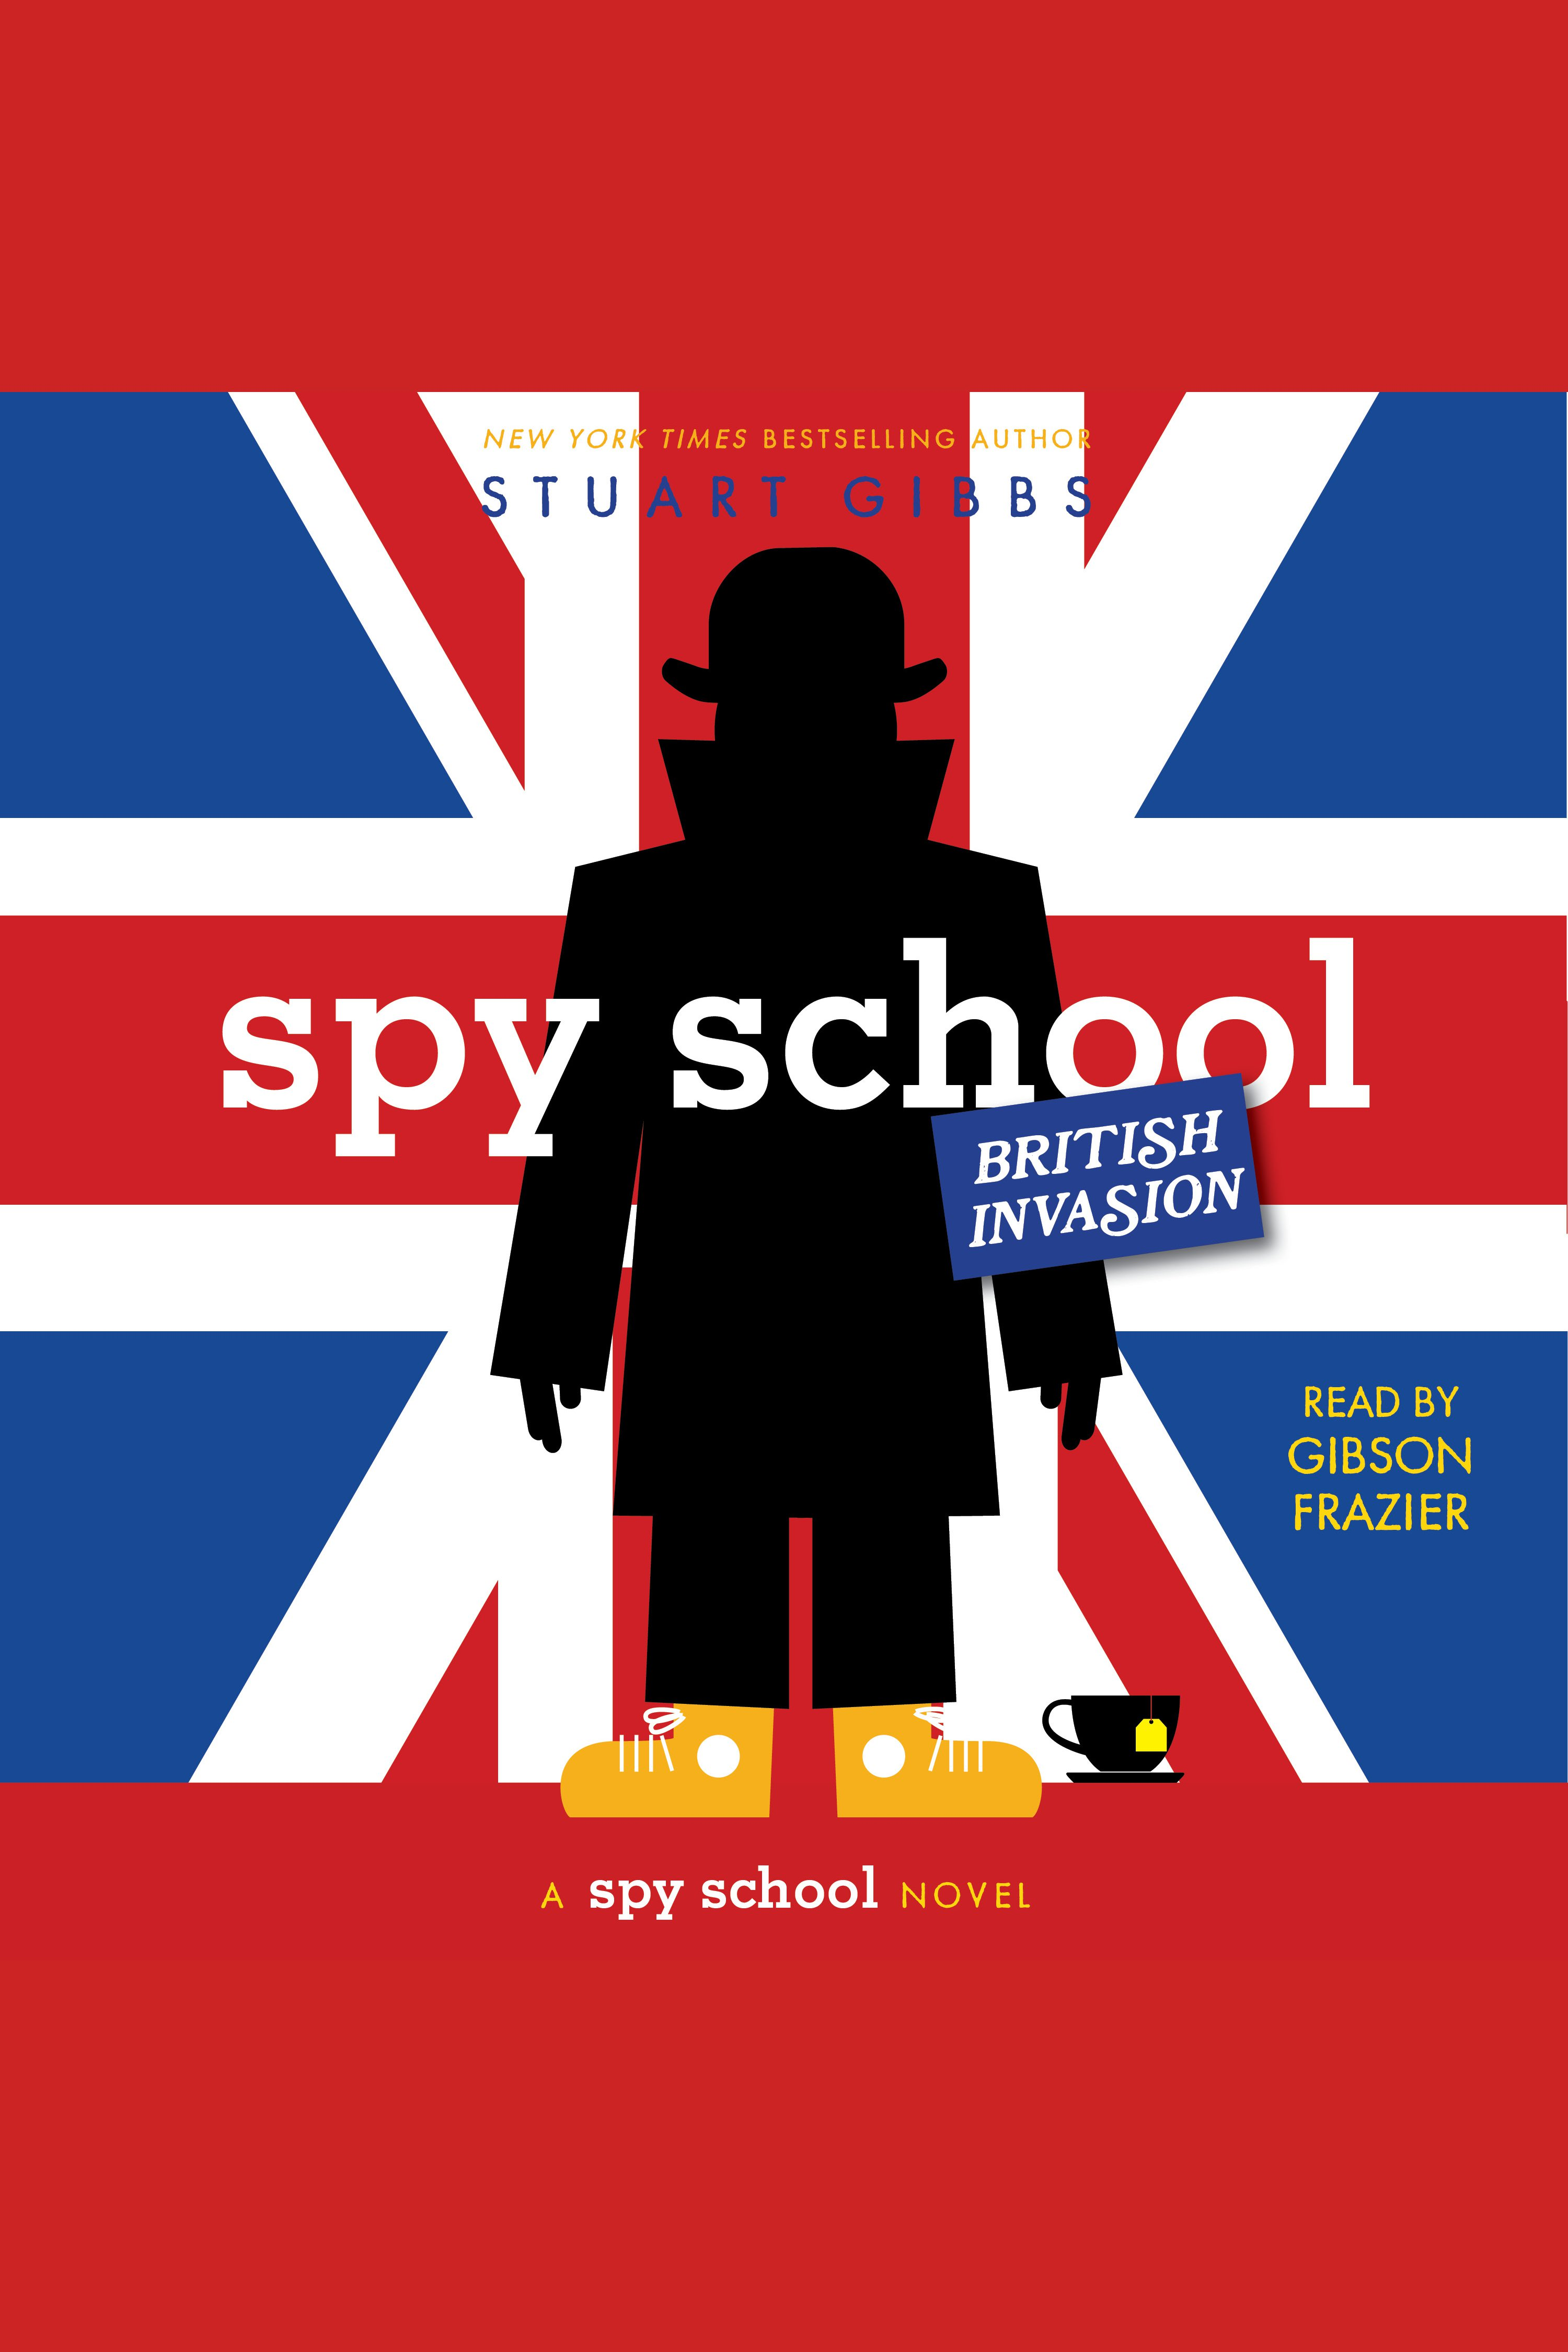 Spy School British Invasion cover image